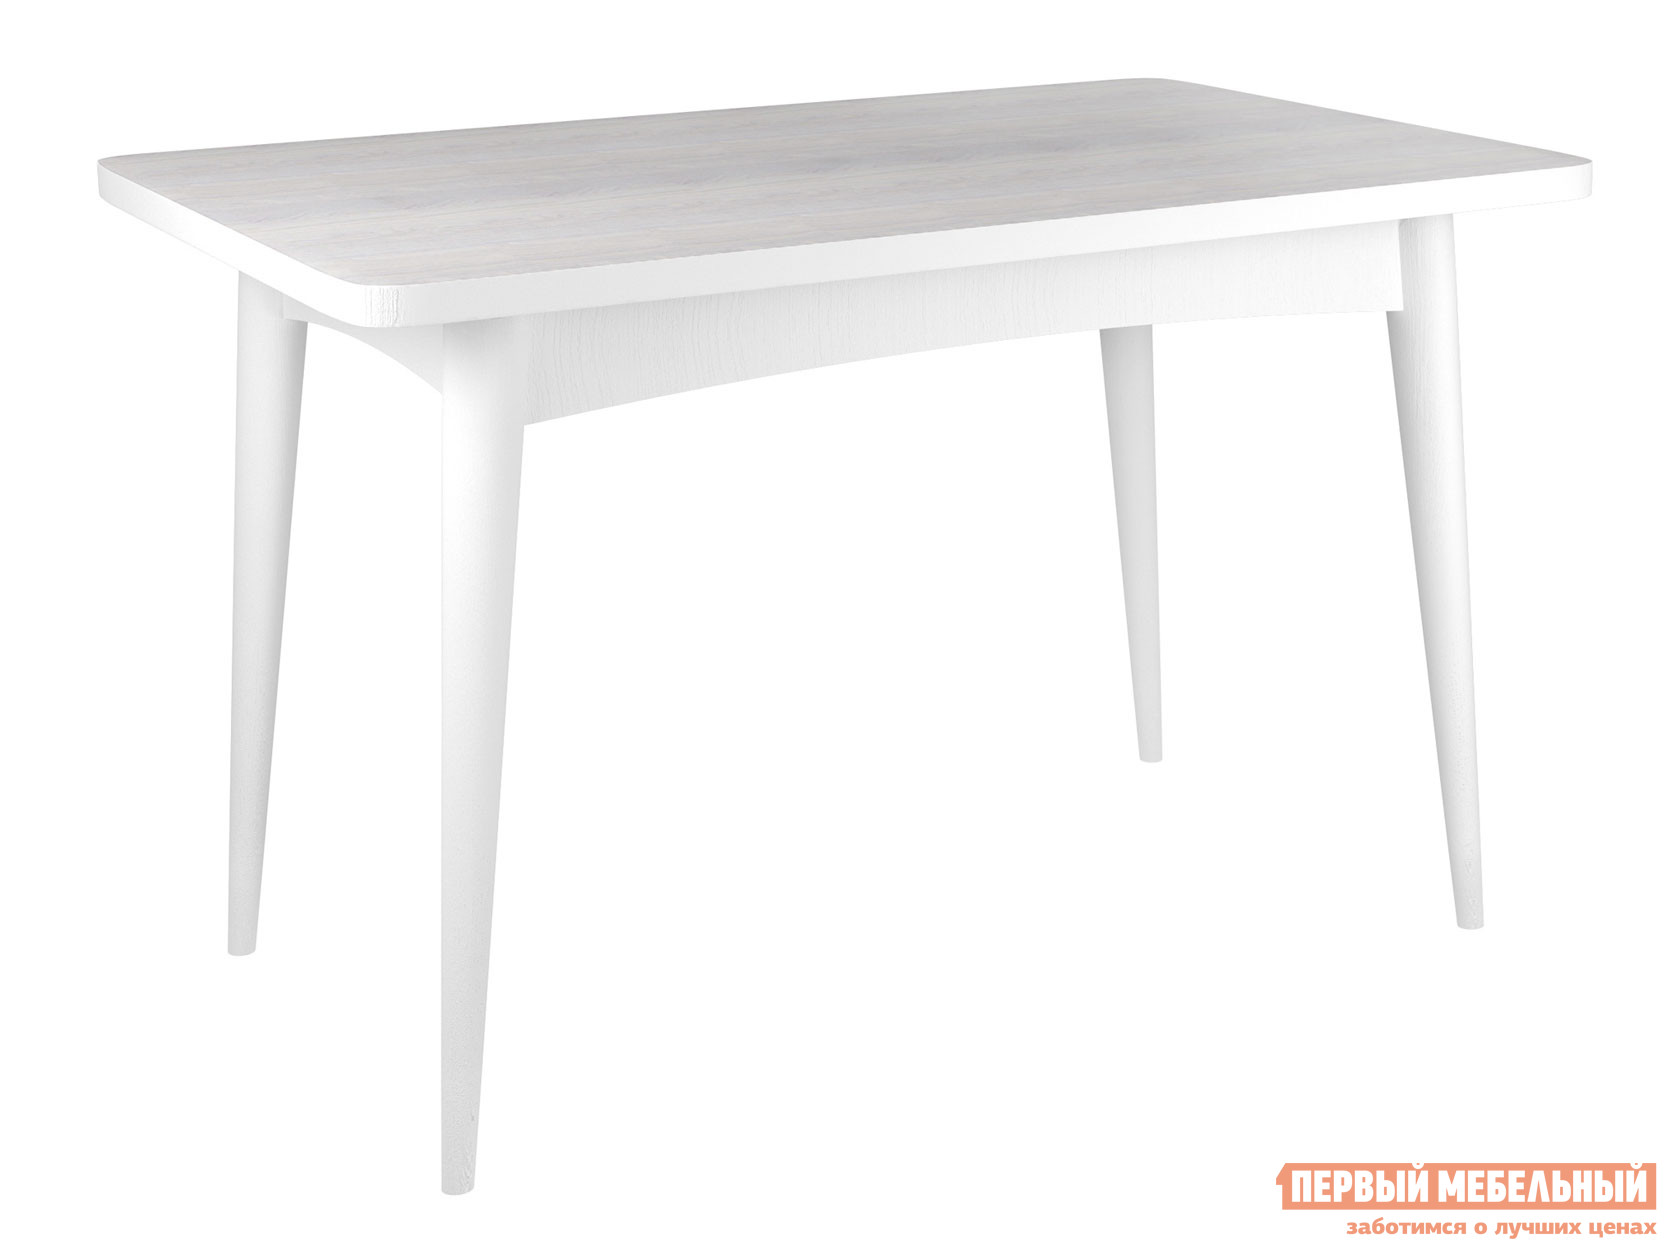 Кухонный стол  раскладной Ялта 2 Белый / Анкор светлый Mebwill 110550